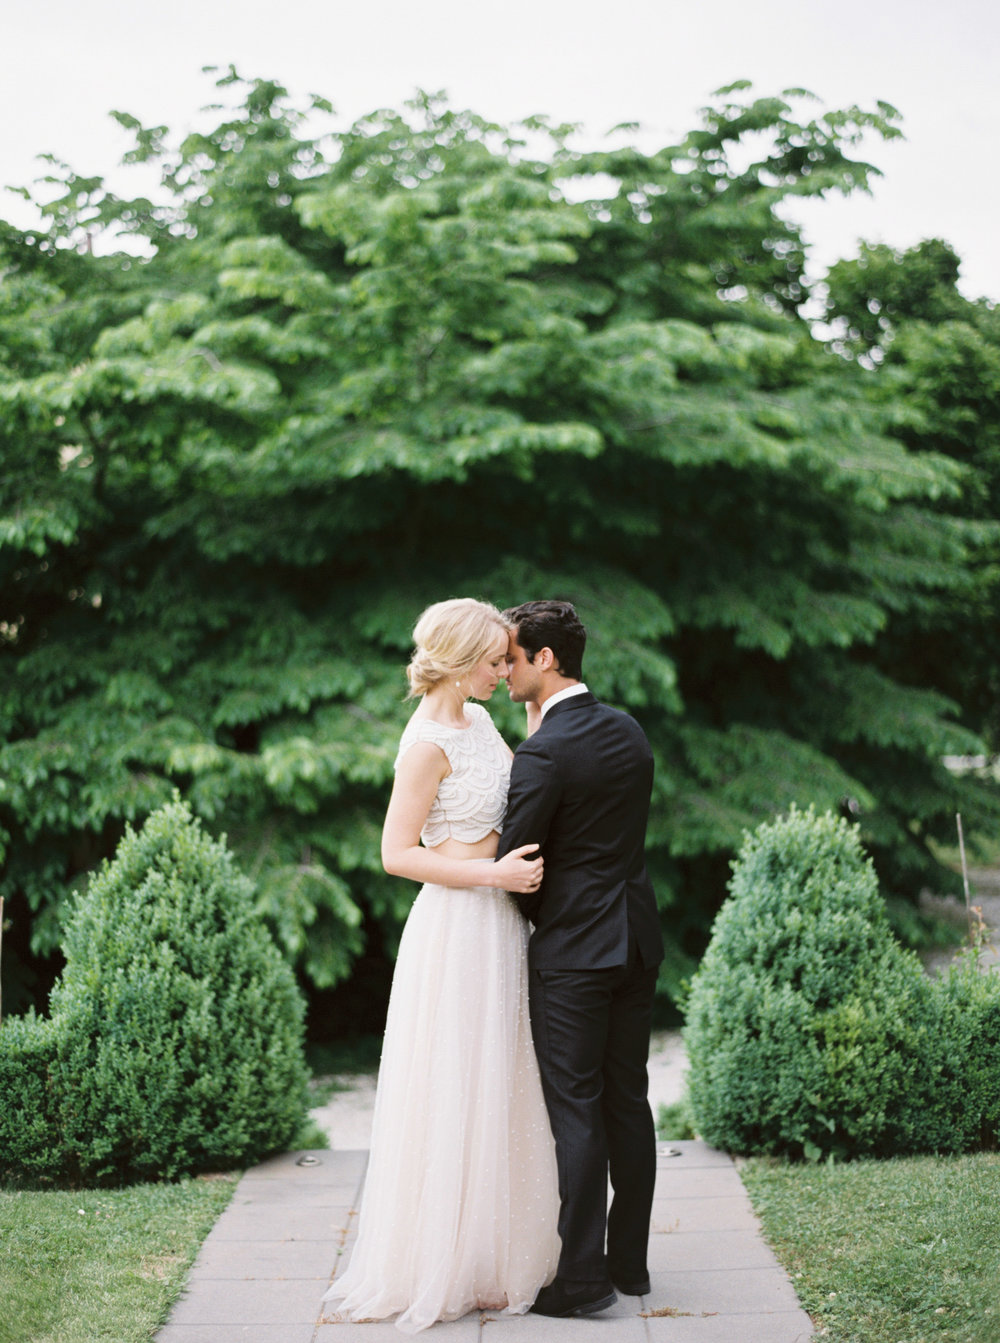 Timeless Southern Highland Wedding Elopement in Bowral NSW Fine Art Film Photographer Sheri McMahon-38.jpg